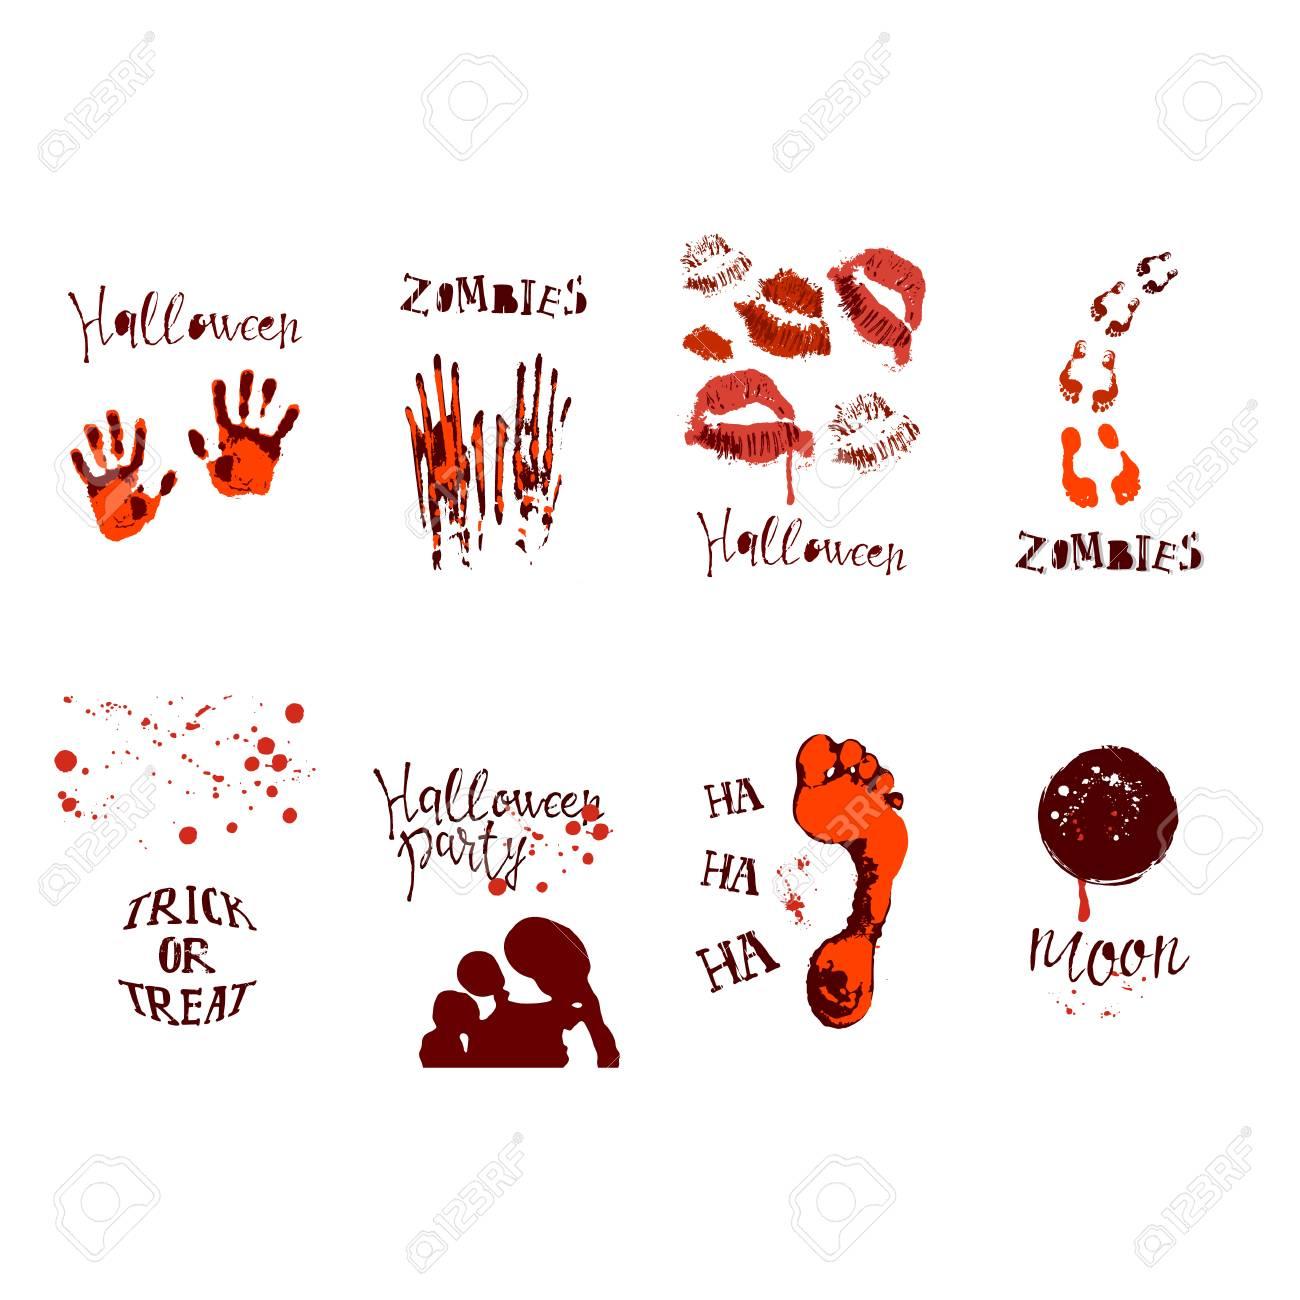 Set Of Designs With Halloween Symbols Royalty Free Cliparts Vectors